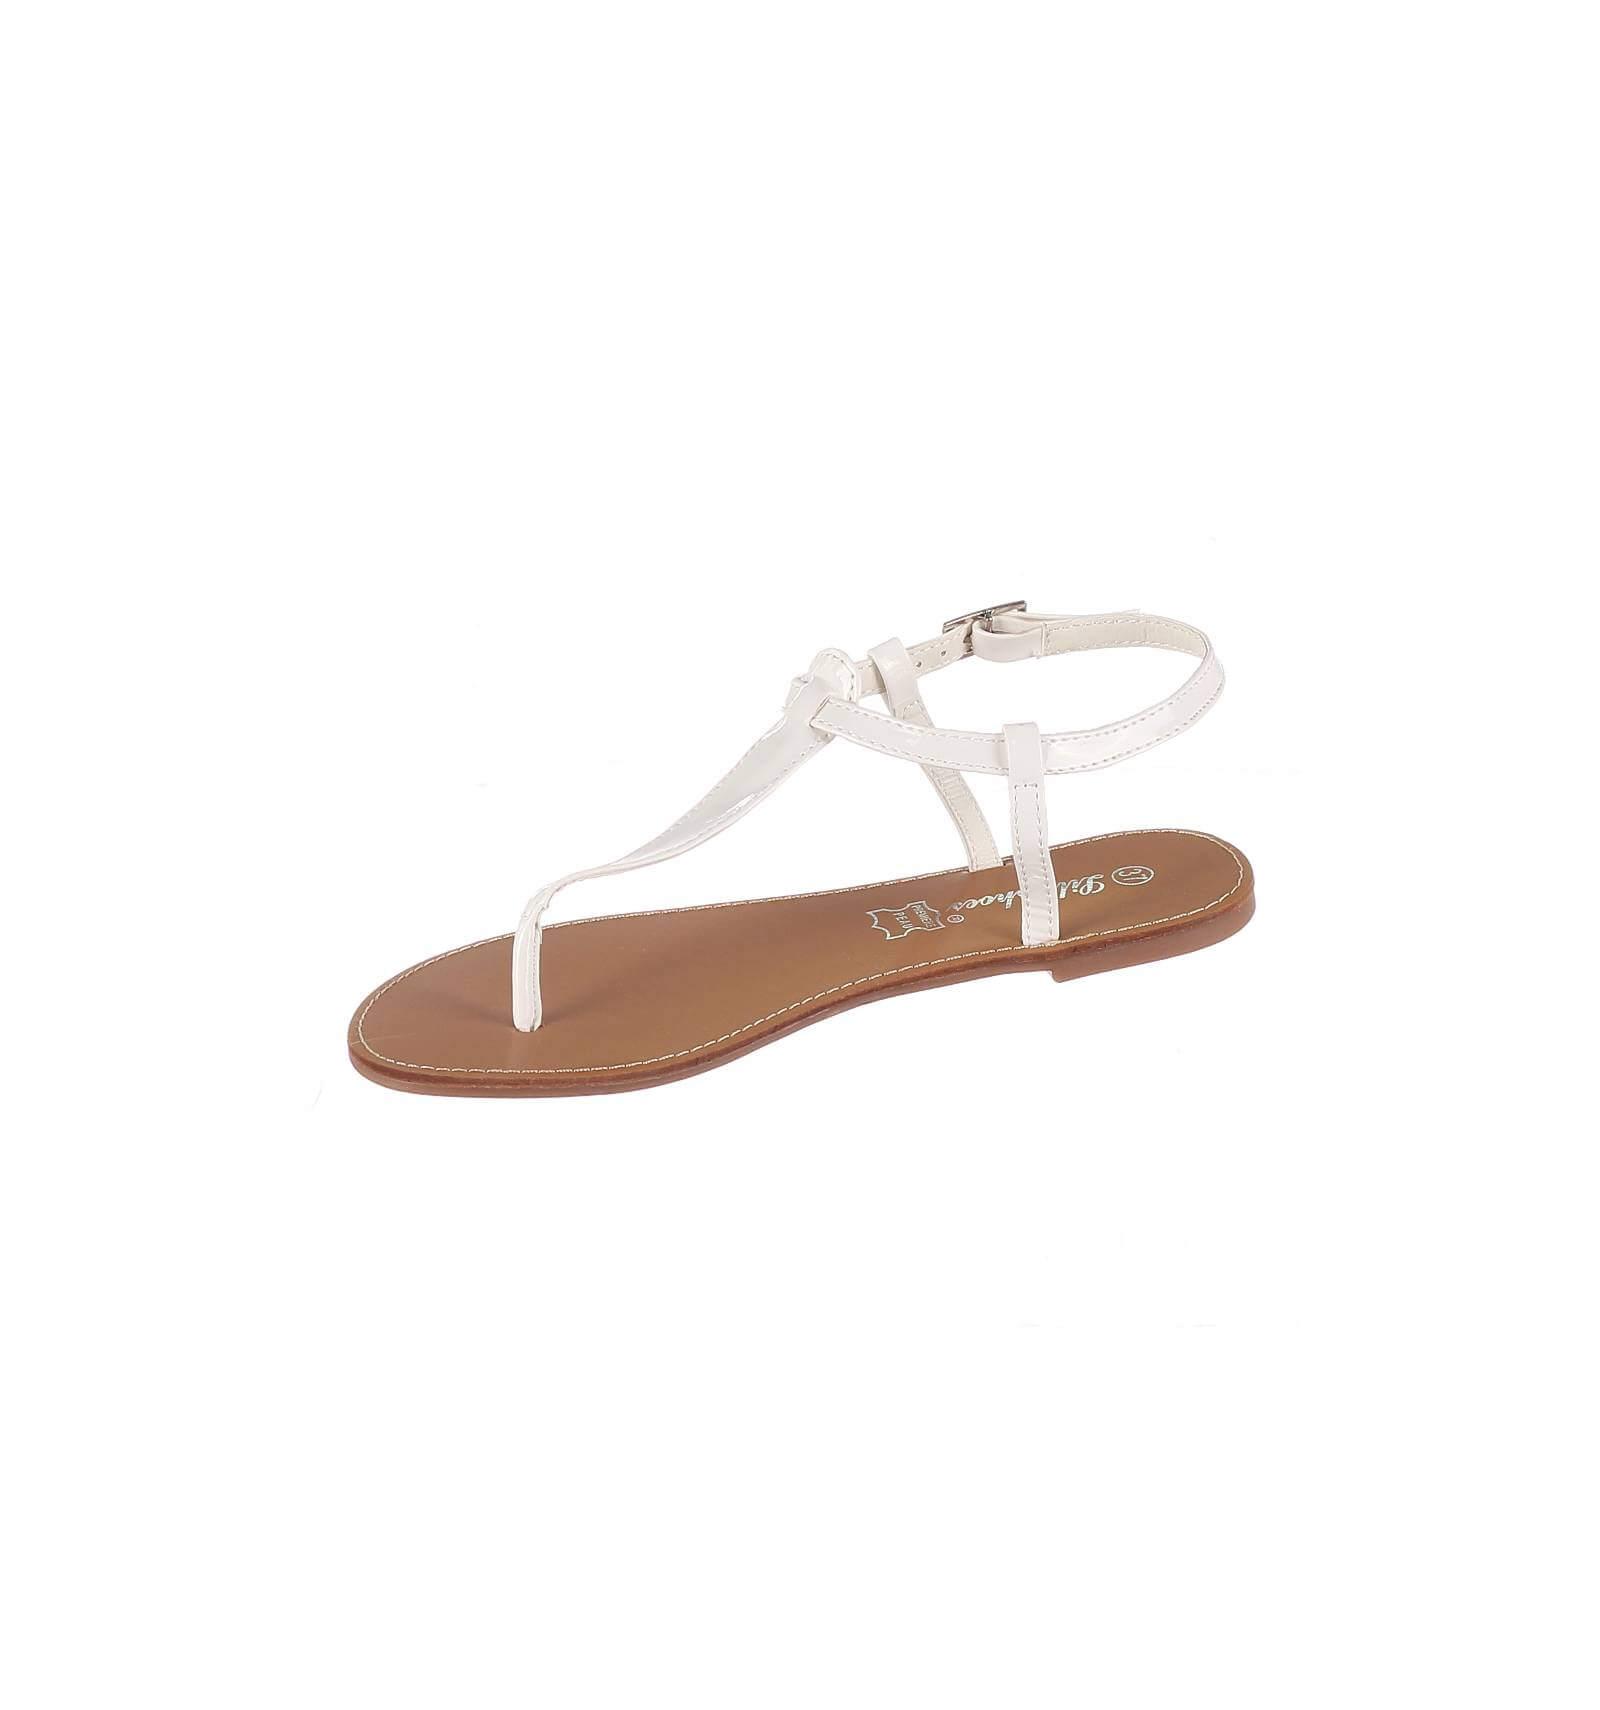 sandales femme plates blanc verni ibiza. Black Bedroom Furniture Sets. Home Design Ideas